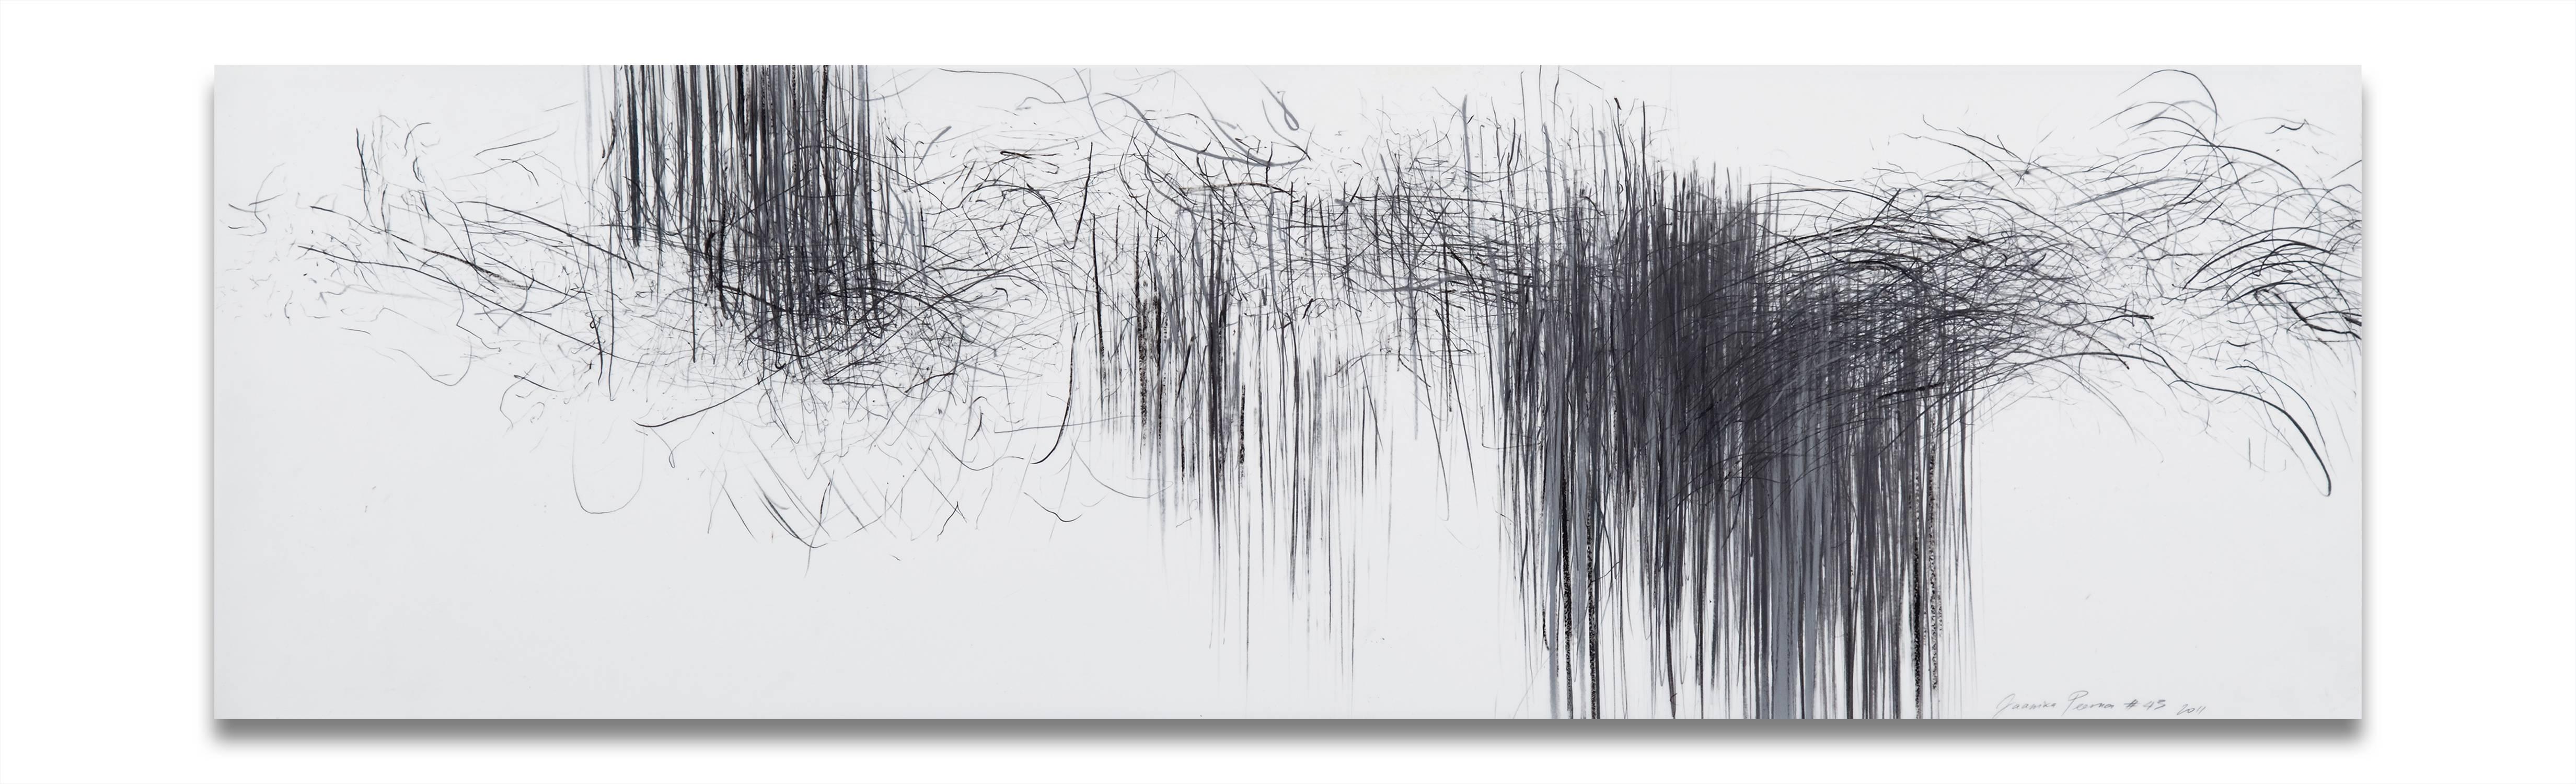 Storm series horizontal 43 (Abstract drawing)